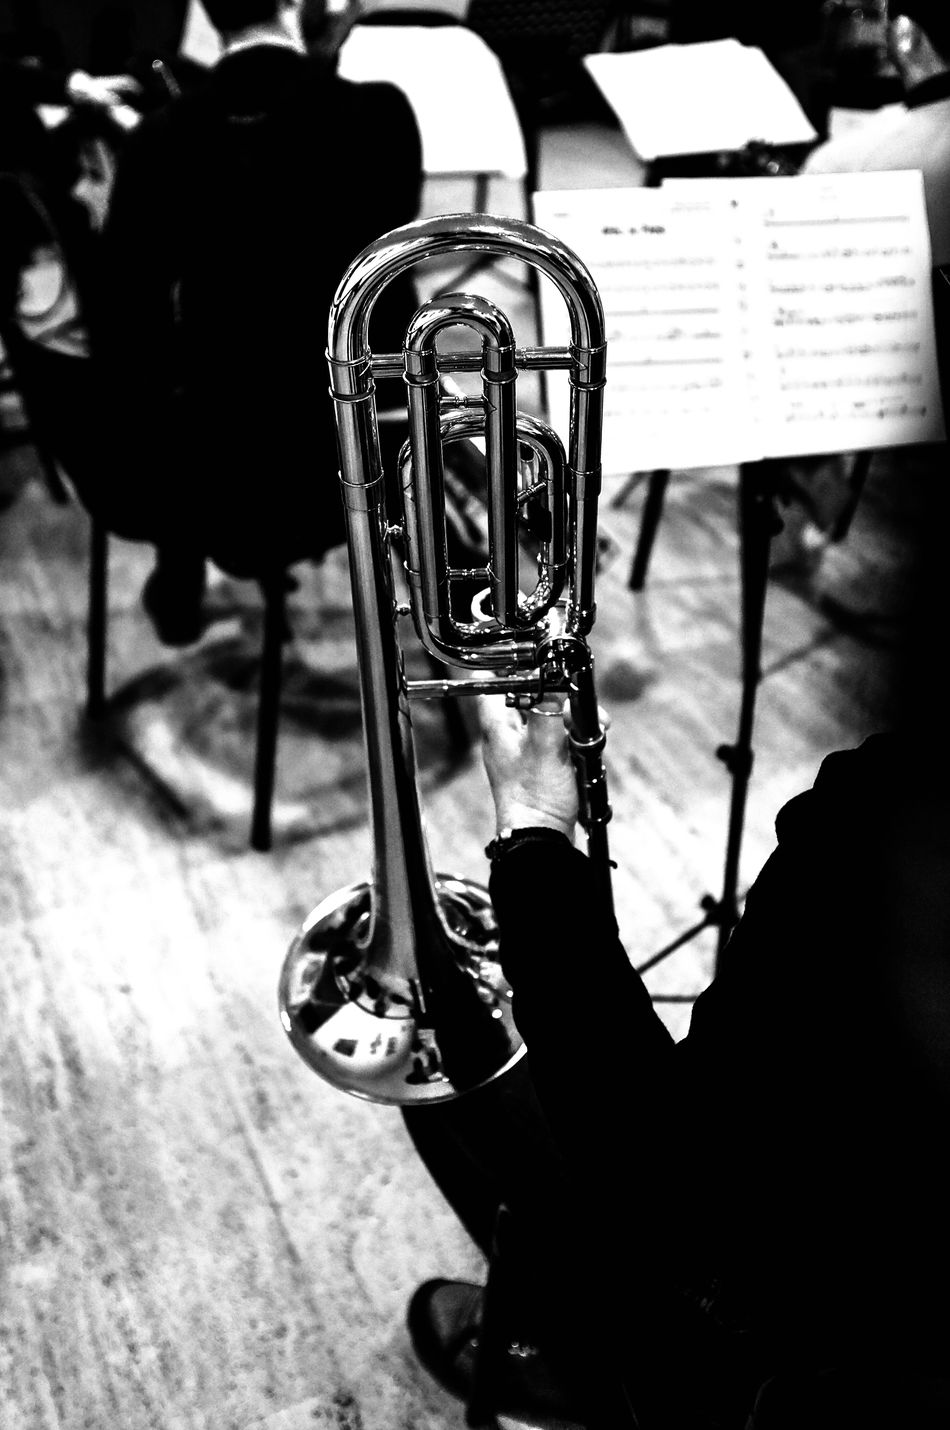 Jazz Jazzband Trombone Blackandwhite Shooting Music Musical Instruments Musician Black And White Photography Blackandwhitephotography EyeEm Best Shots - Black + White